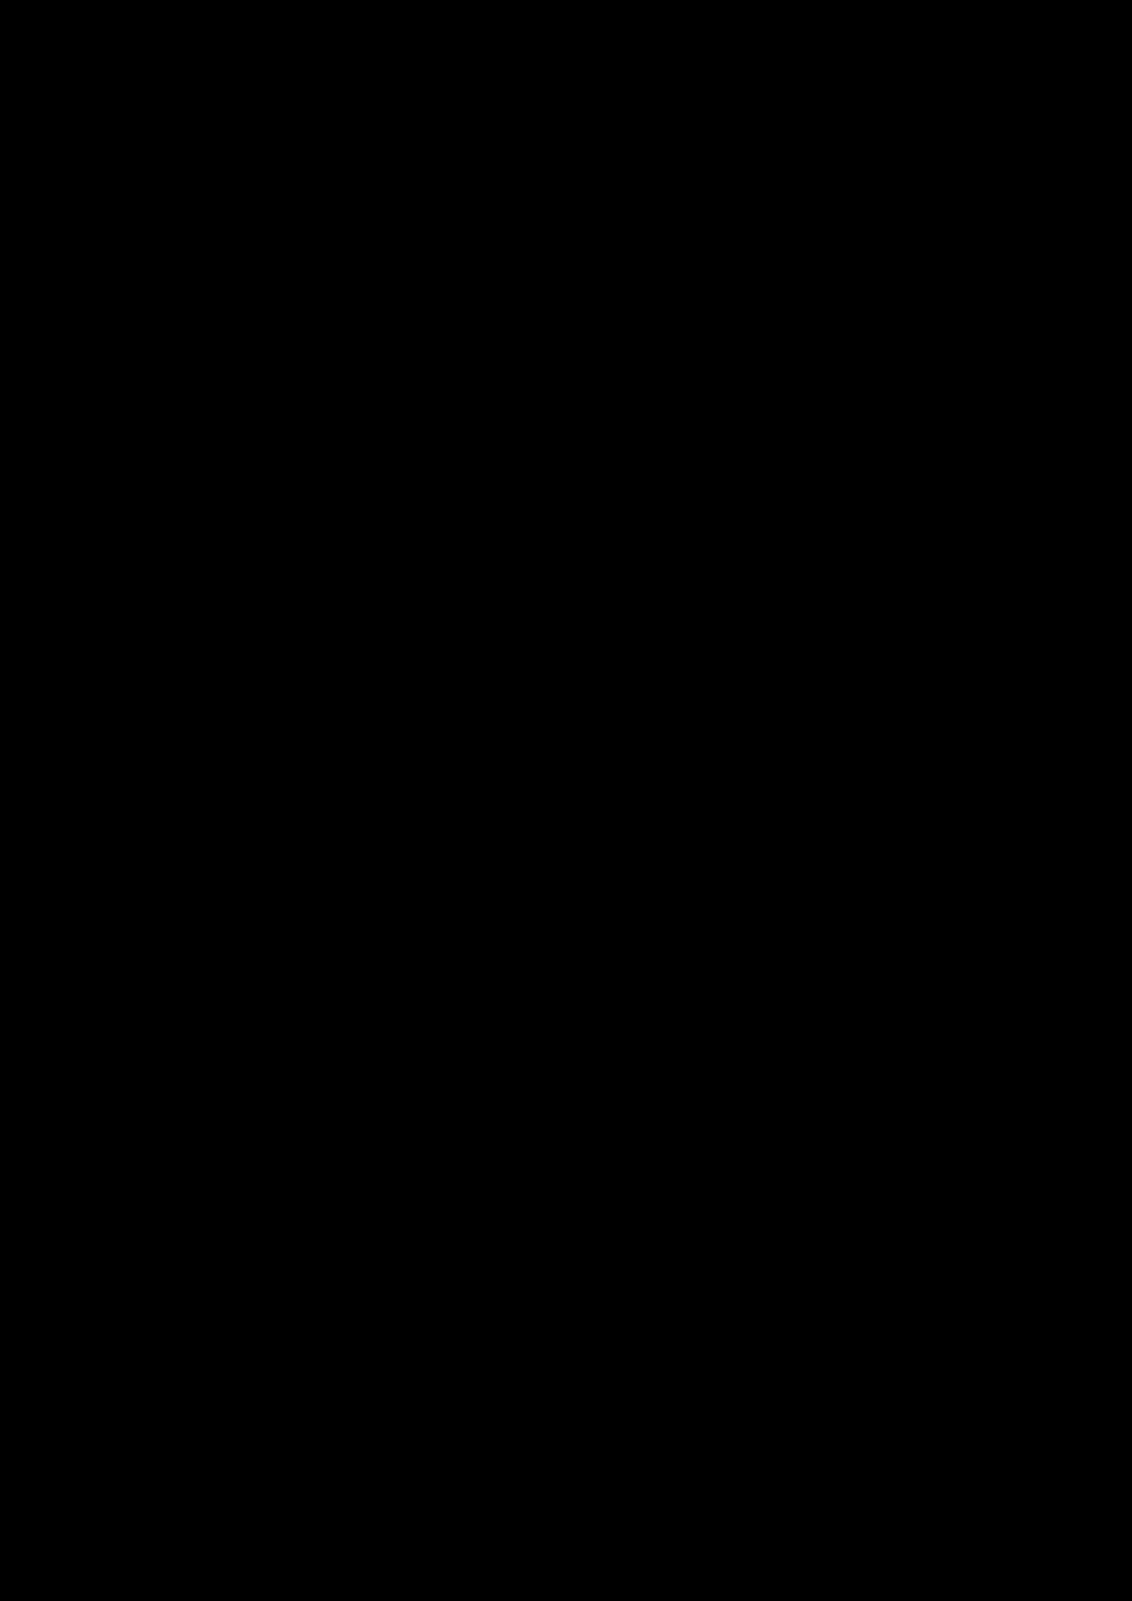 Belyiy sokol slide, Image 122